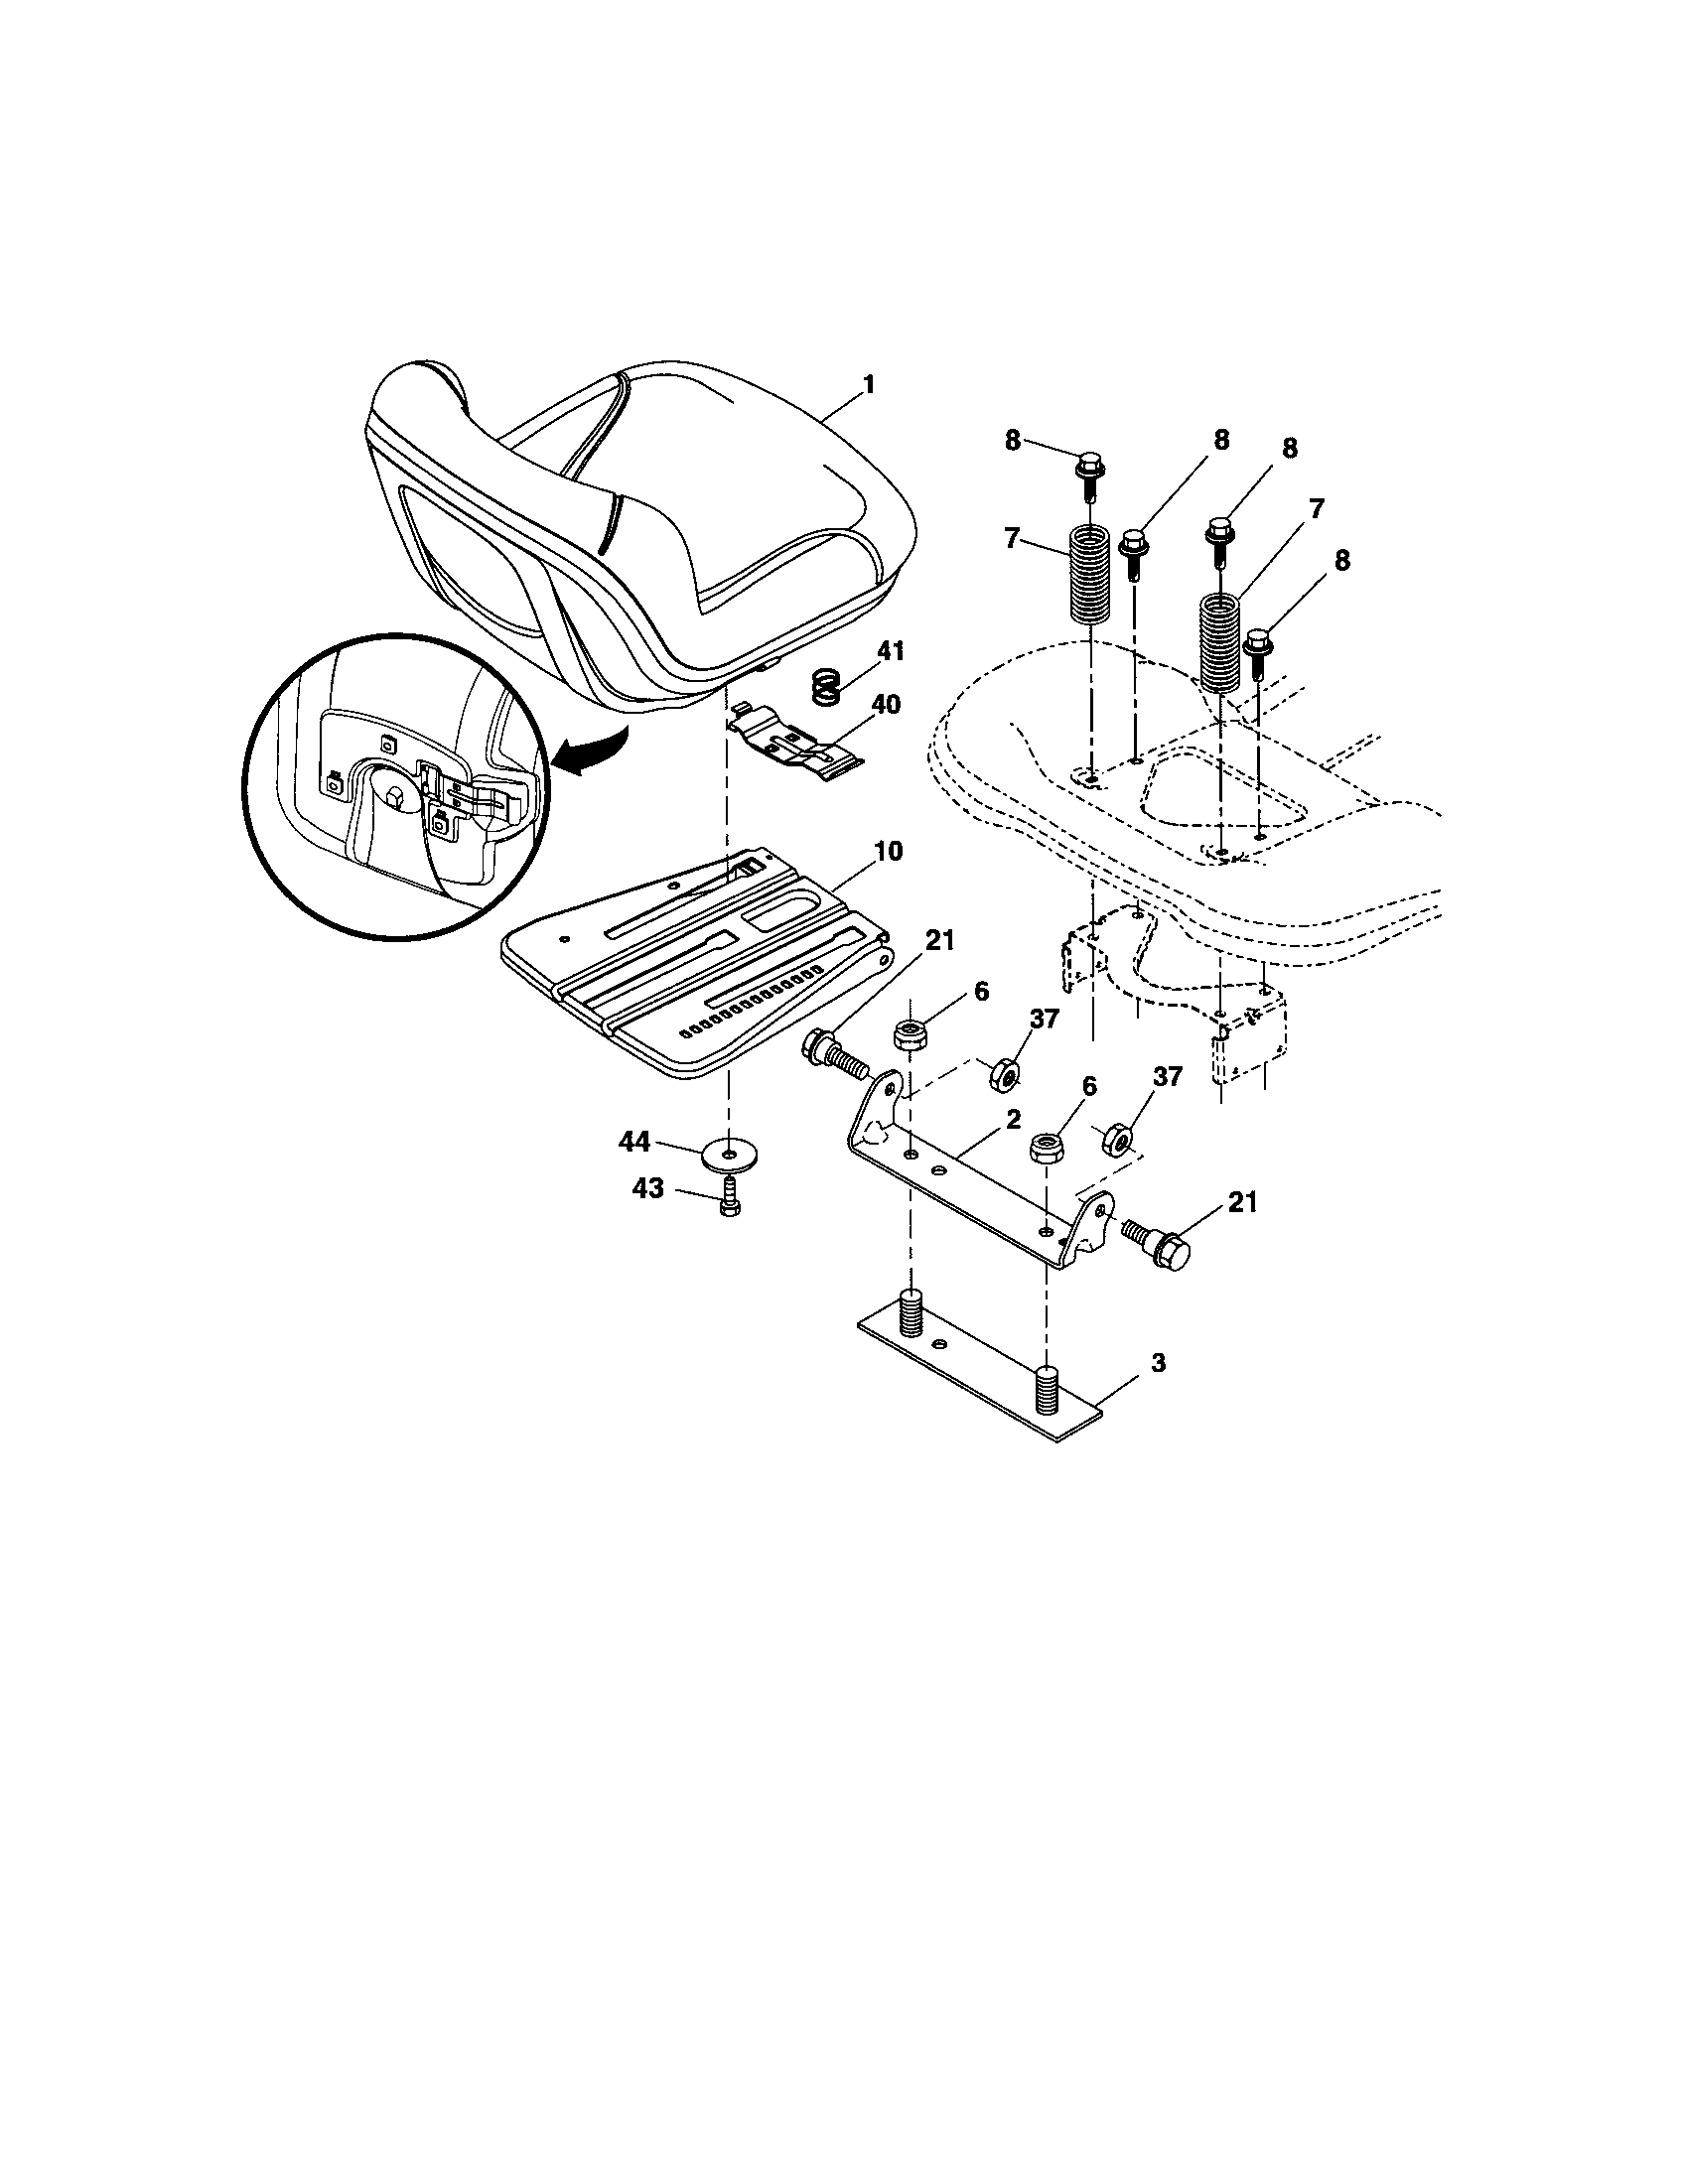 SEAT Diagram & Parts List for Model 917276906 Craftsman